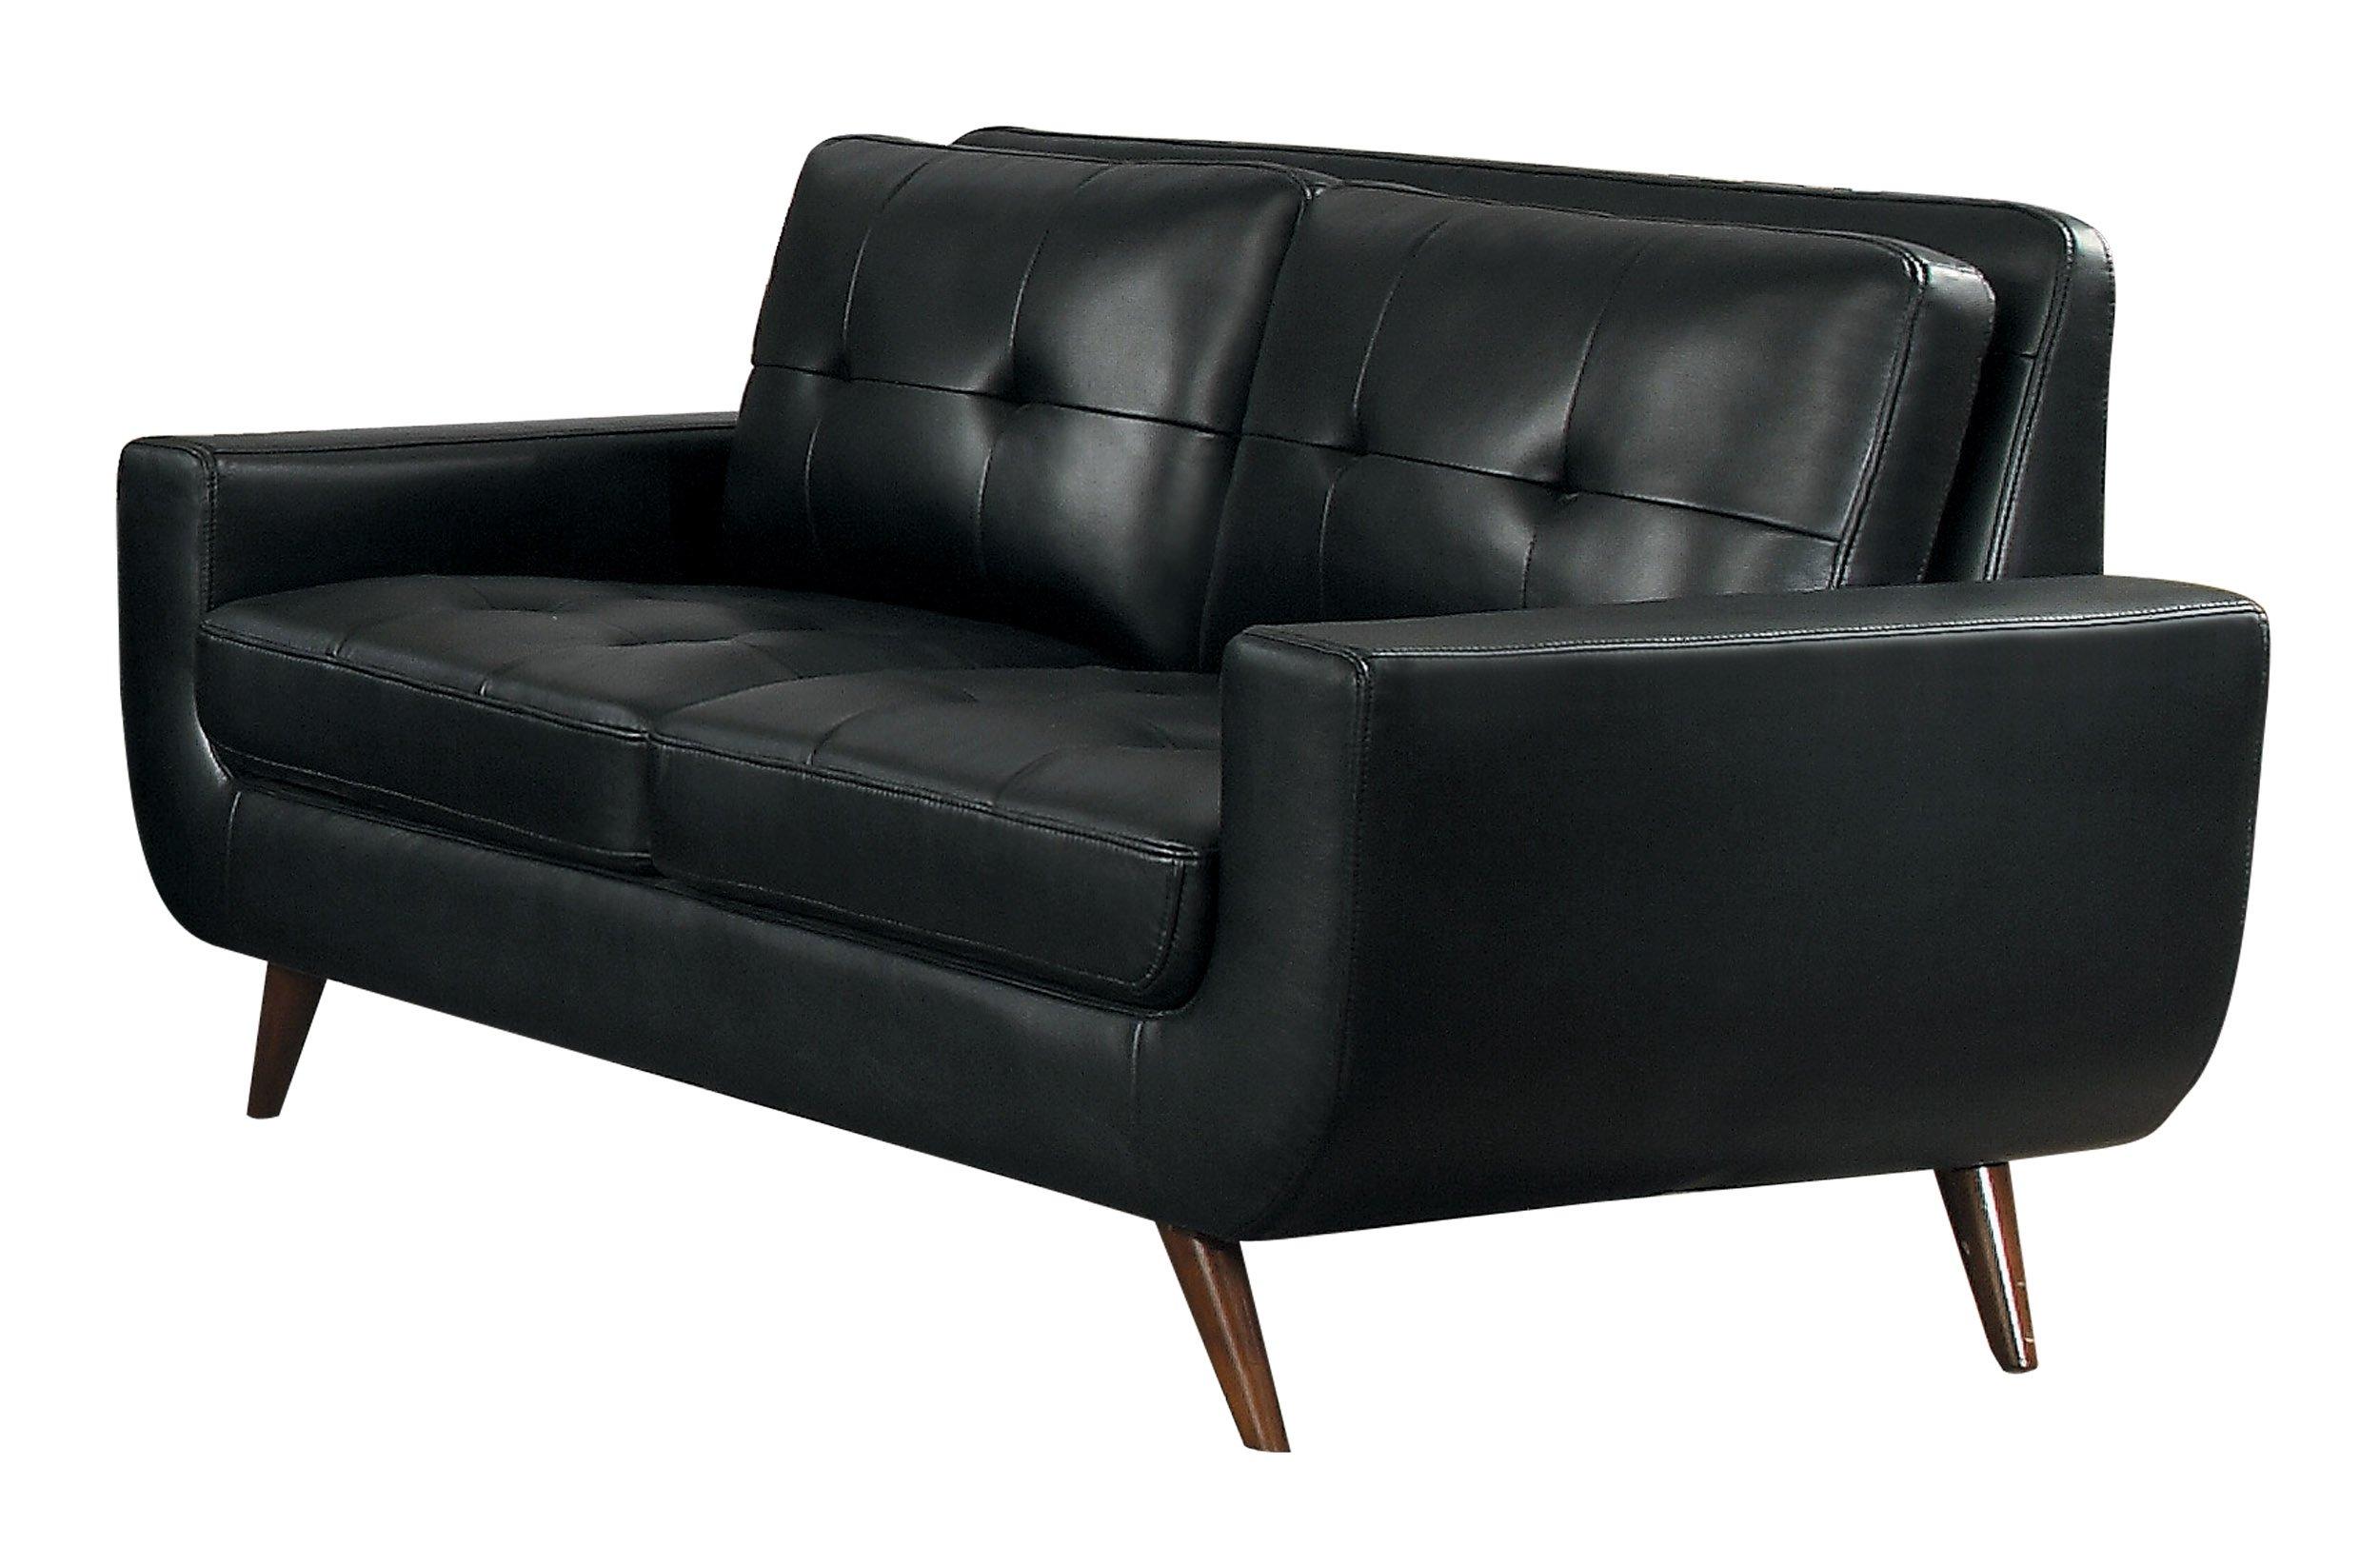 Homelegance Deryn Mid-Century Modern Loveseat with Tufted Back Leather Gel Matched, Black